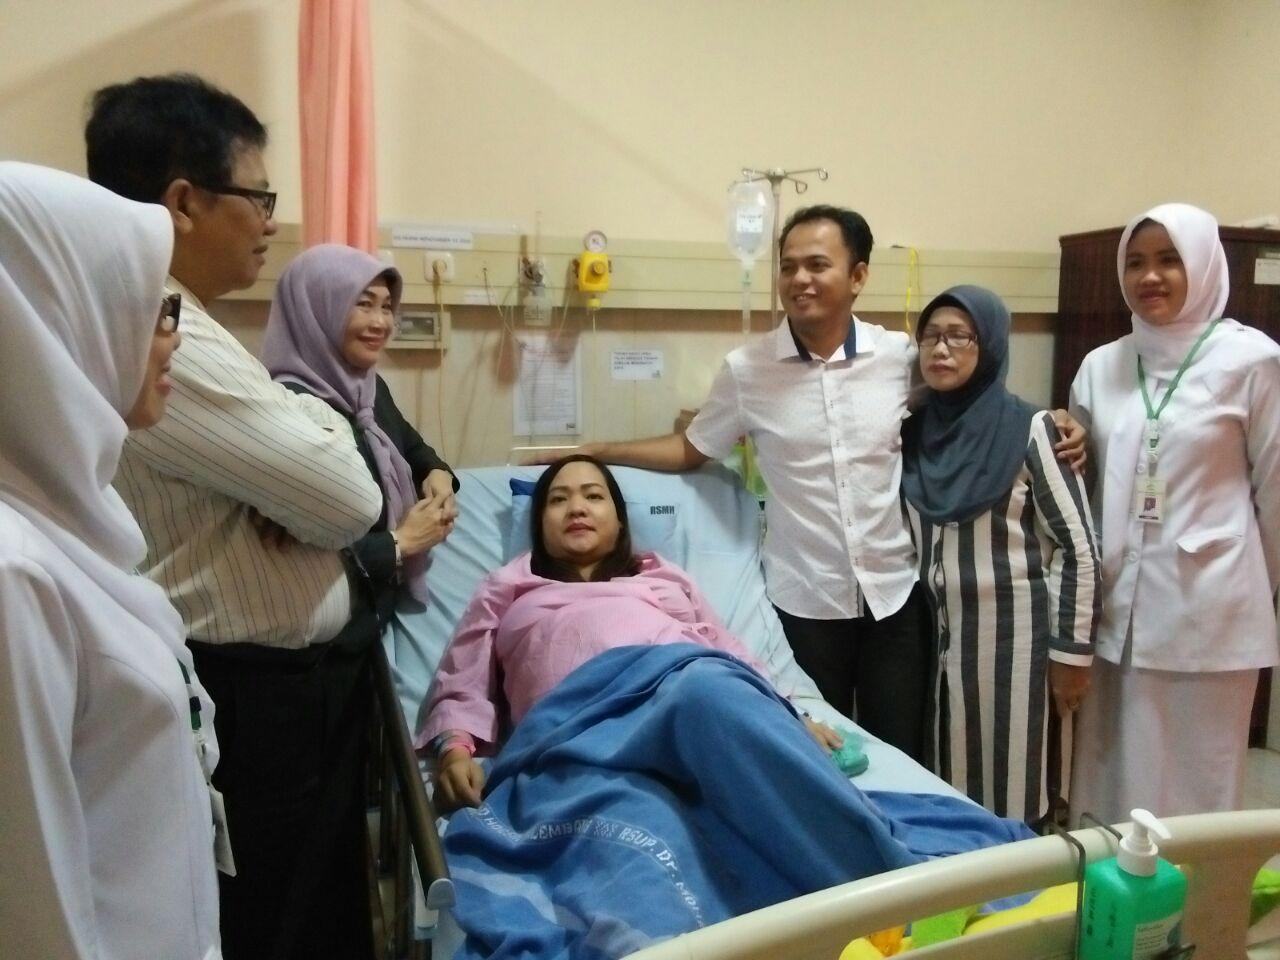 Permalink to Seorang Ibu Lahirkan Bayi Kembarkan 4 di RSMH Palembang